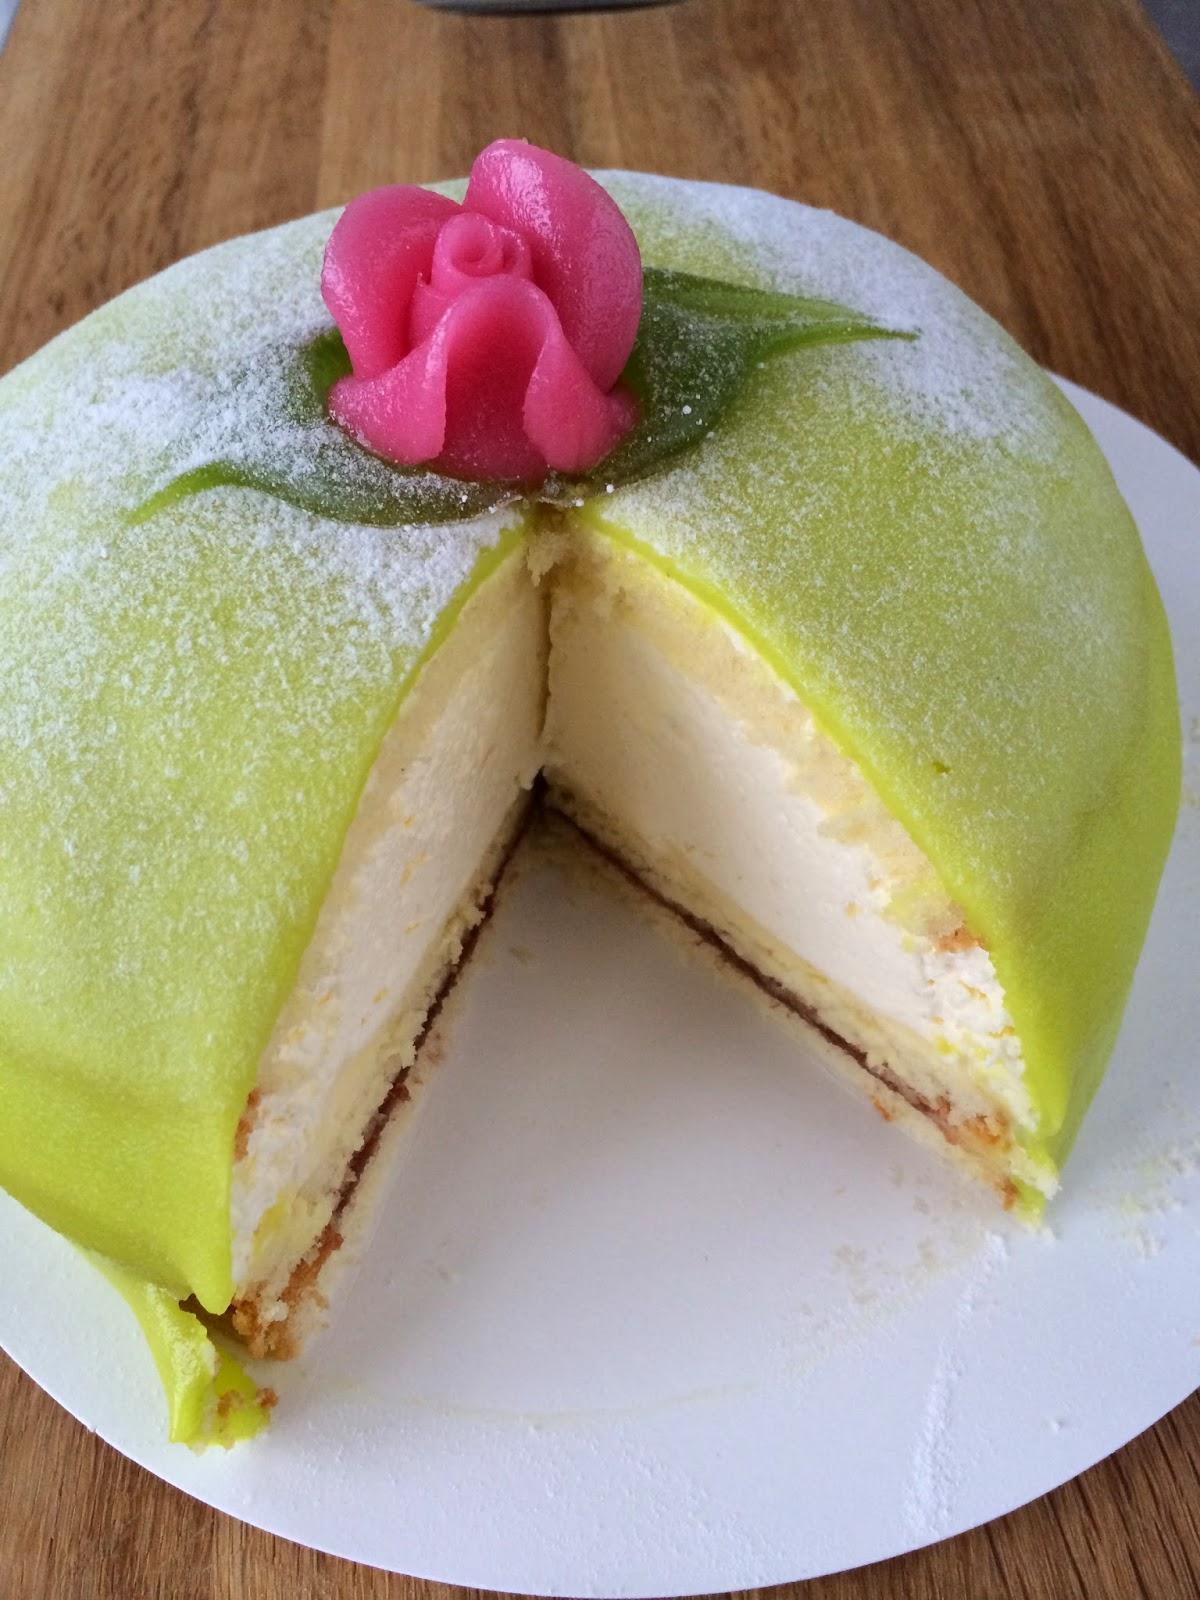 A Swedish classic - Princess Cake